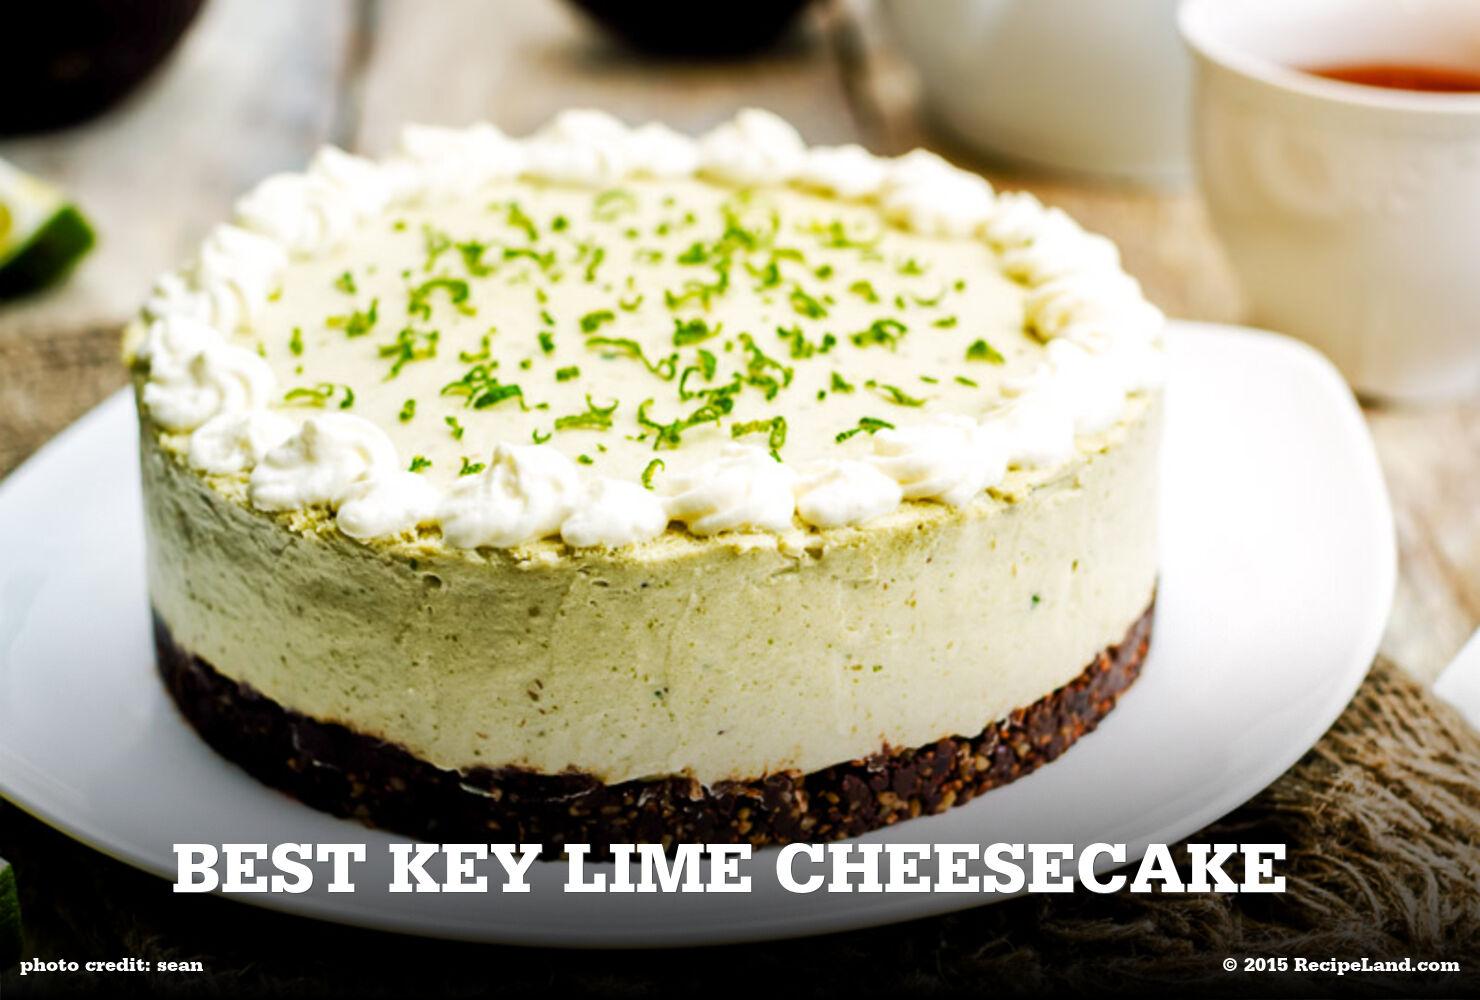 Best Key Lime Cheesecake